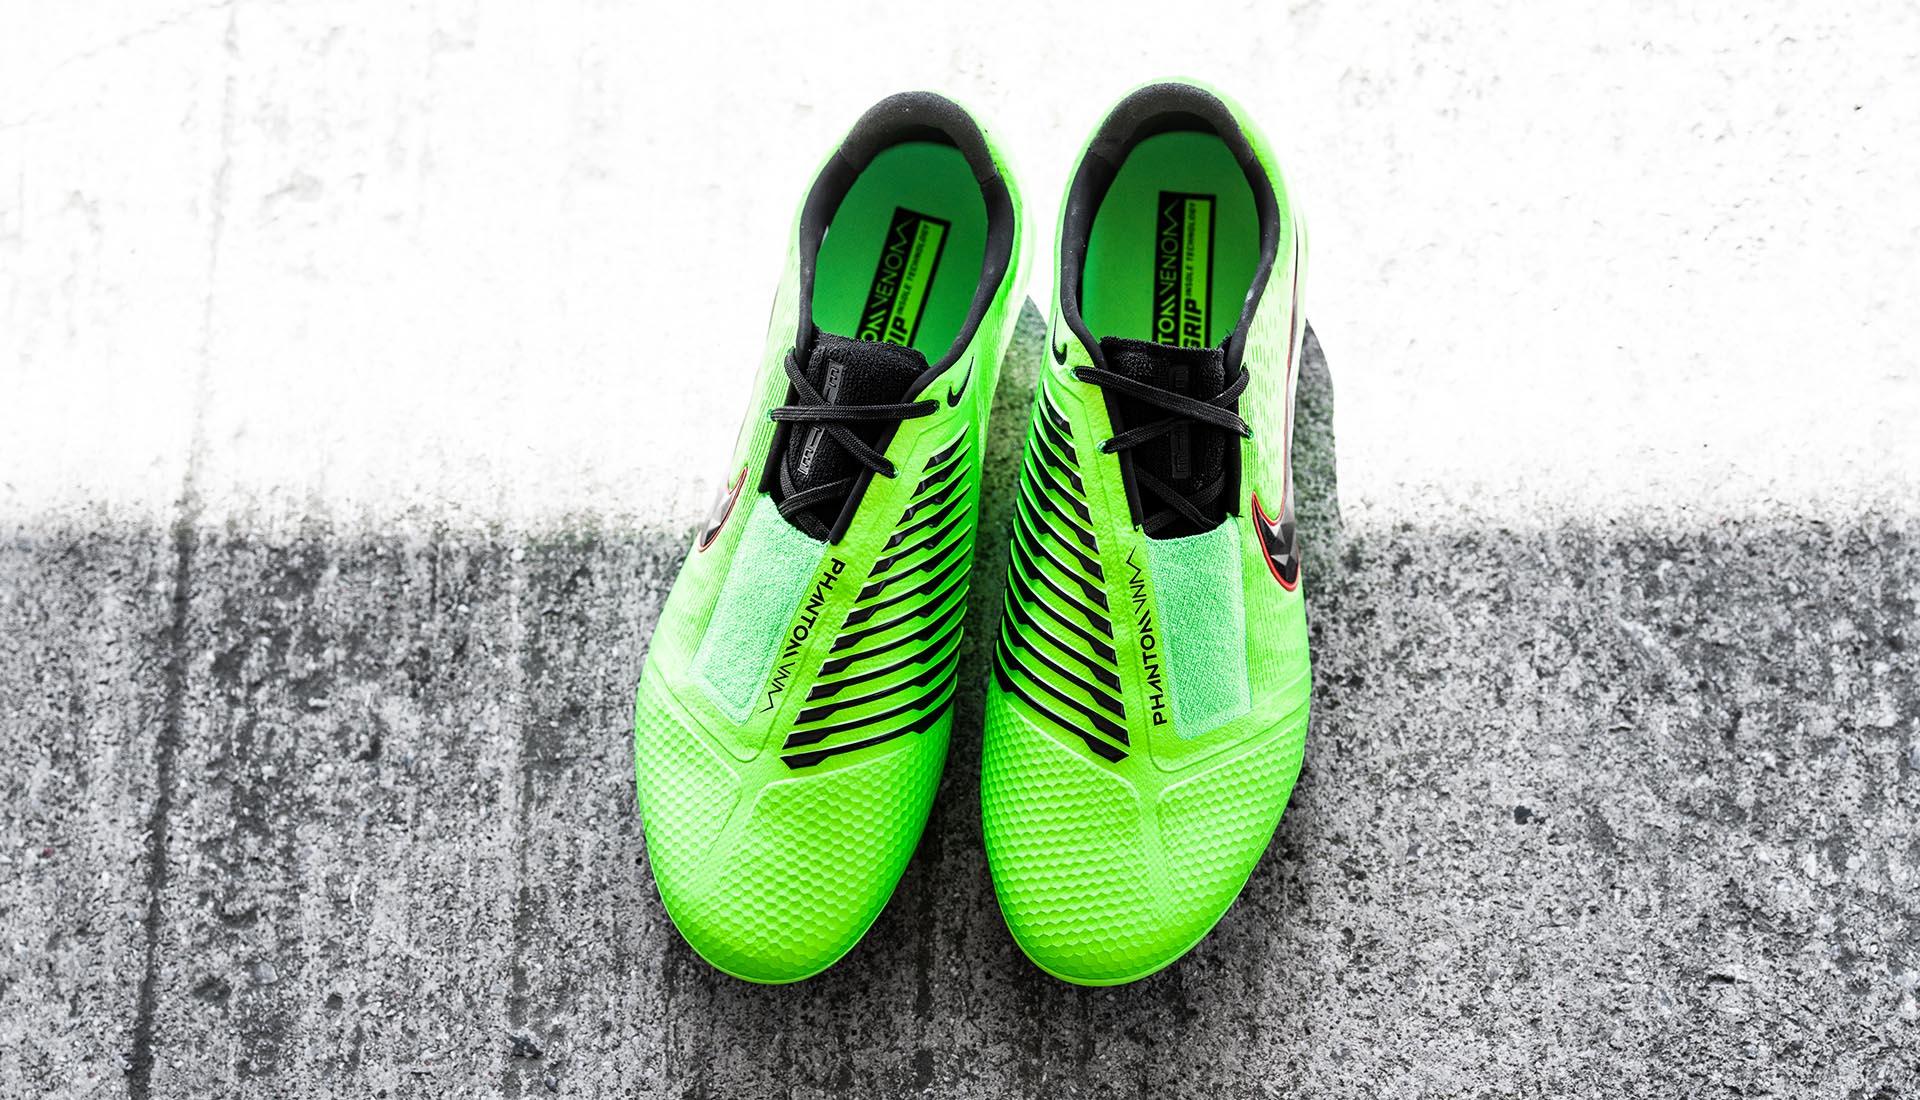 Bo suu tap giay da bong Nike Future lab 2 (II) nam 2020 (2)